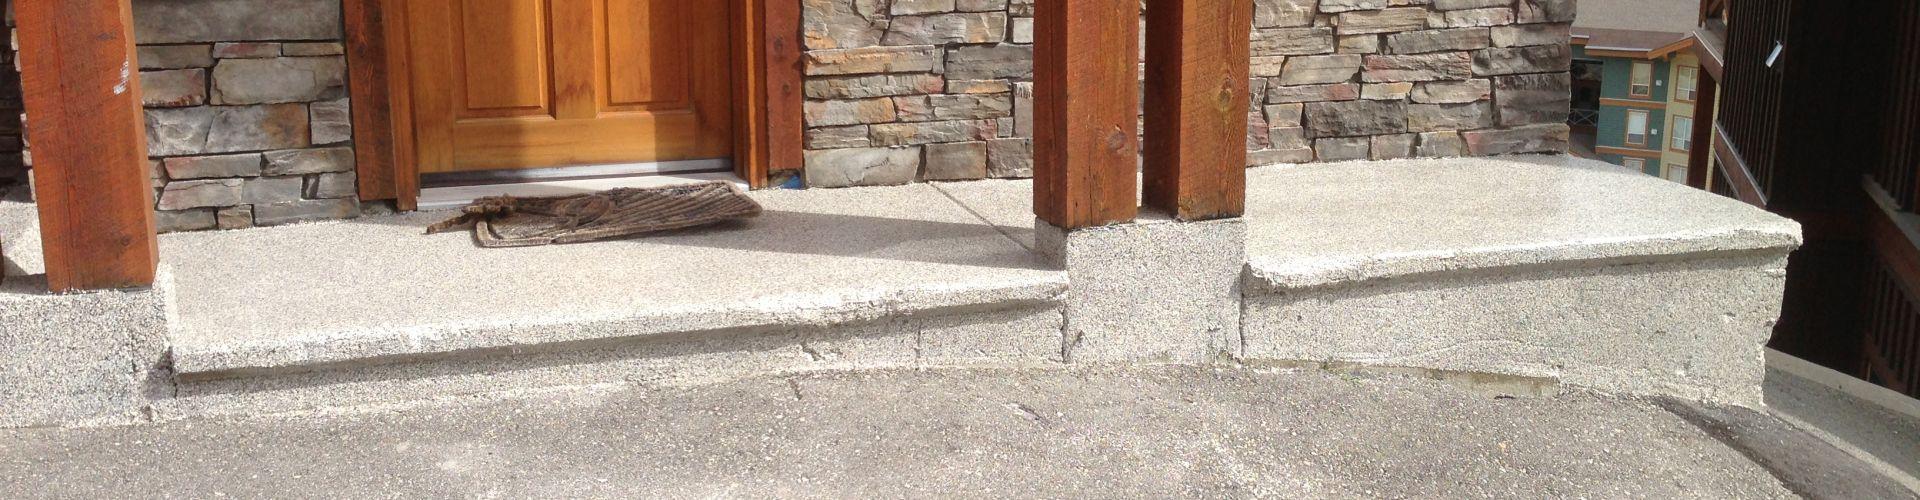 Garage flooring, floor coating, epoxy